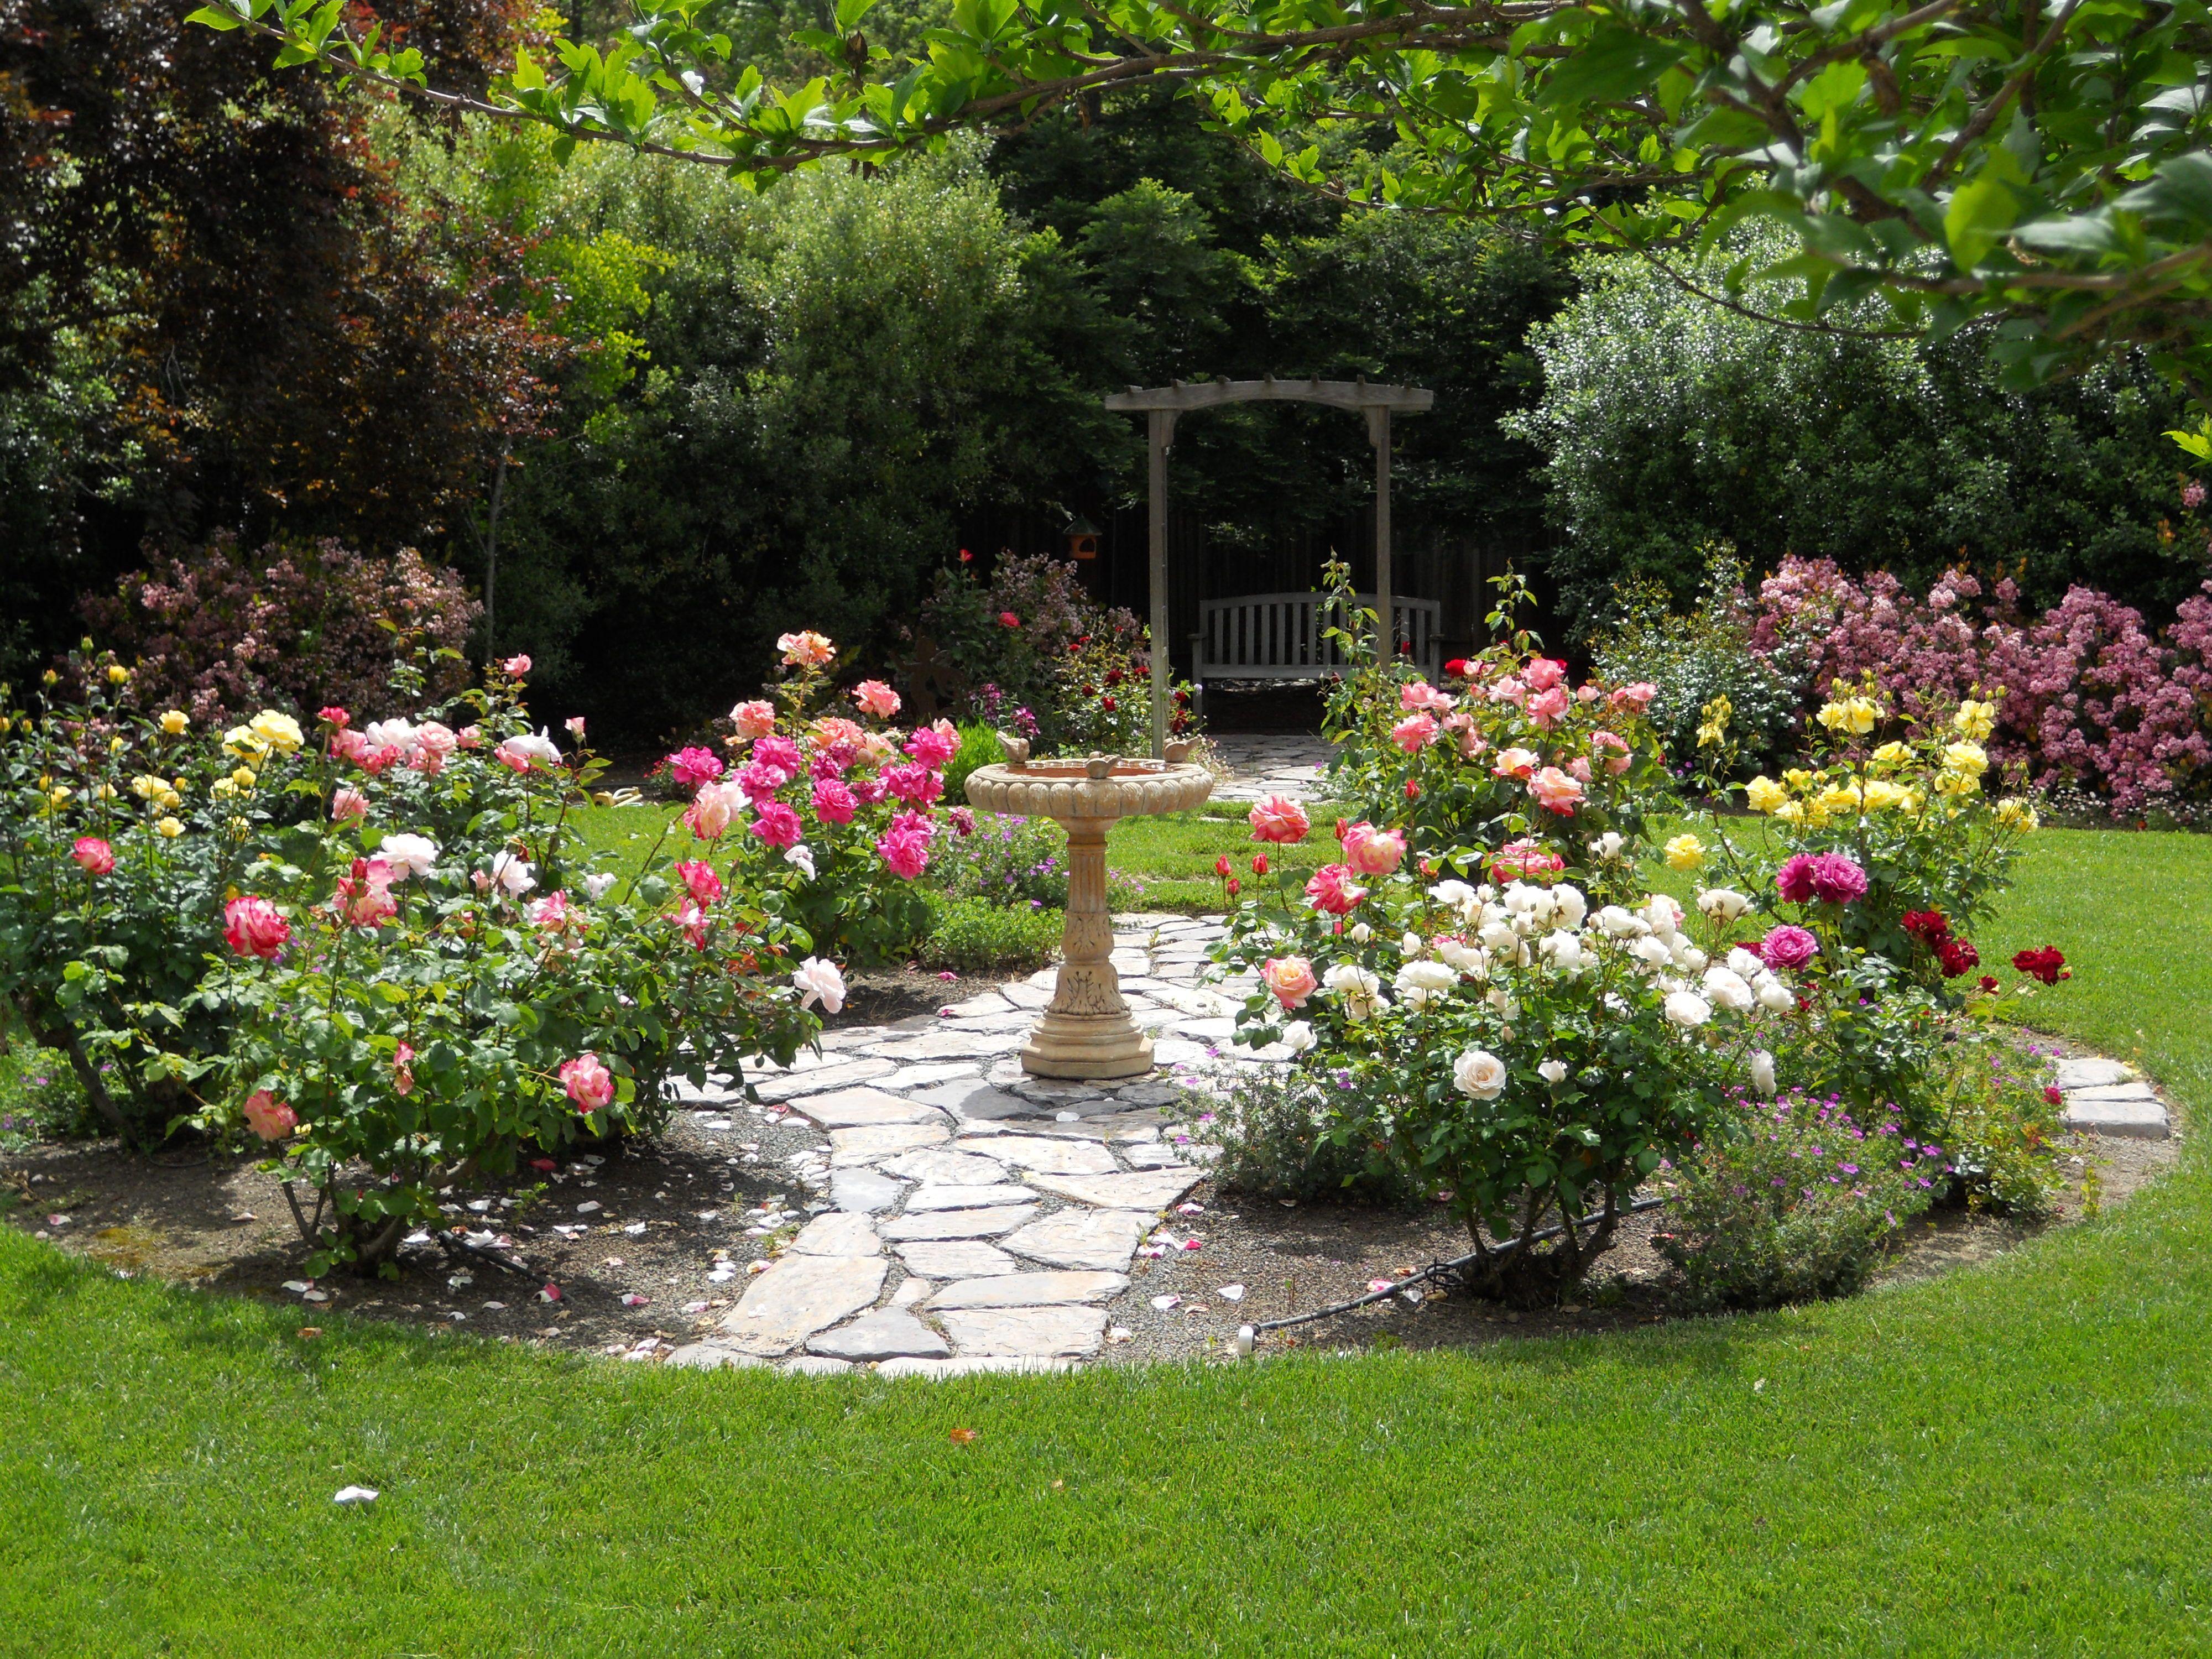 Best ideas about Rose Garden Ideas . Save or Pin Backyard Rose Garden Ideas graph Now.